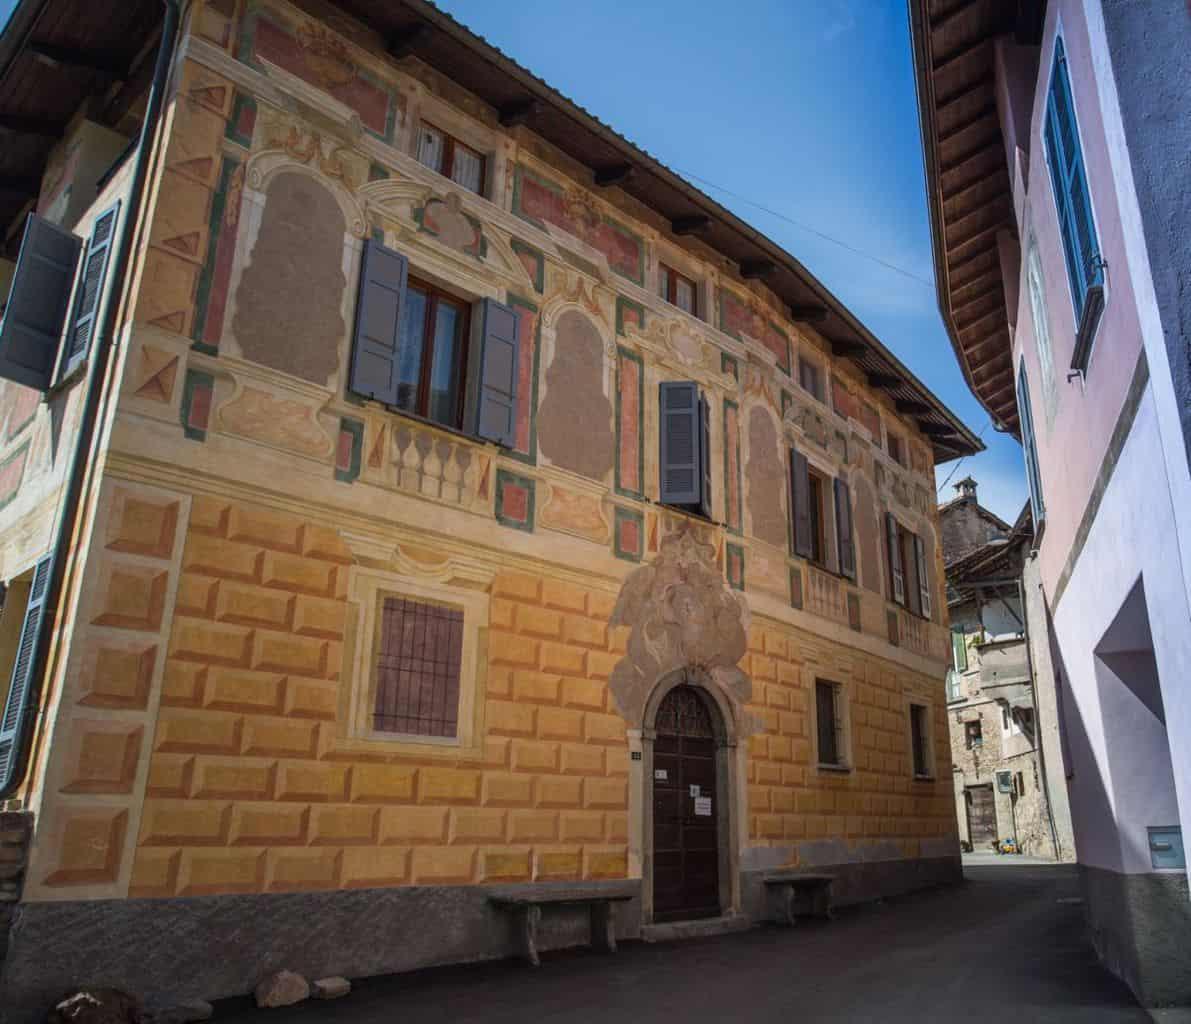 Carona - a Hidden Gem in the Ticino